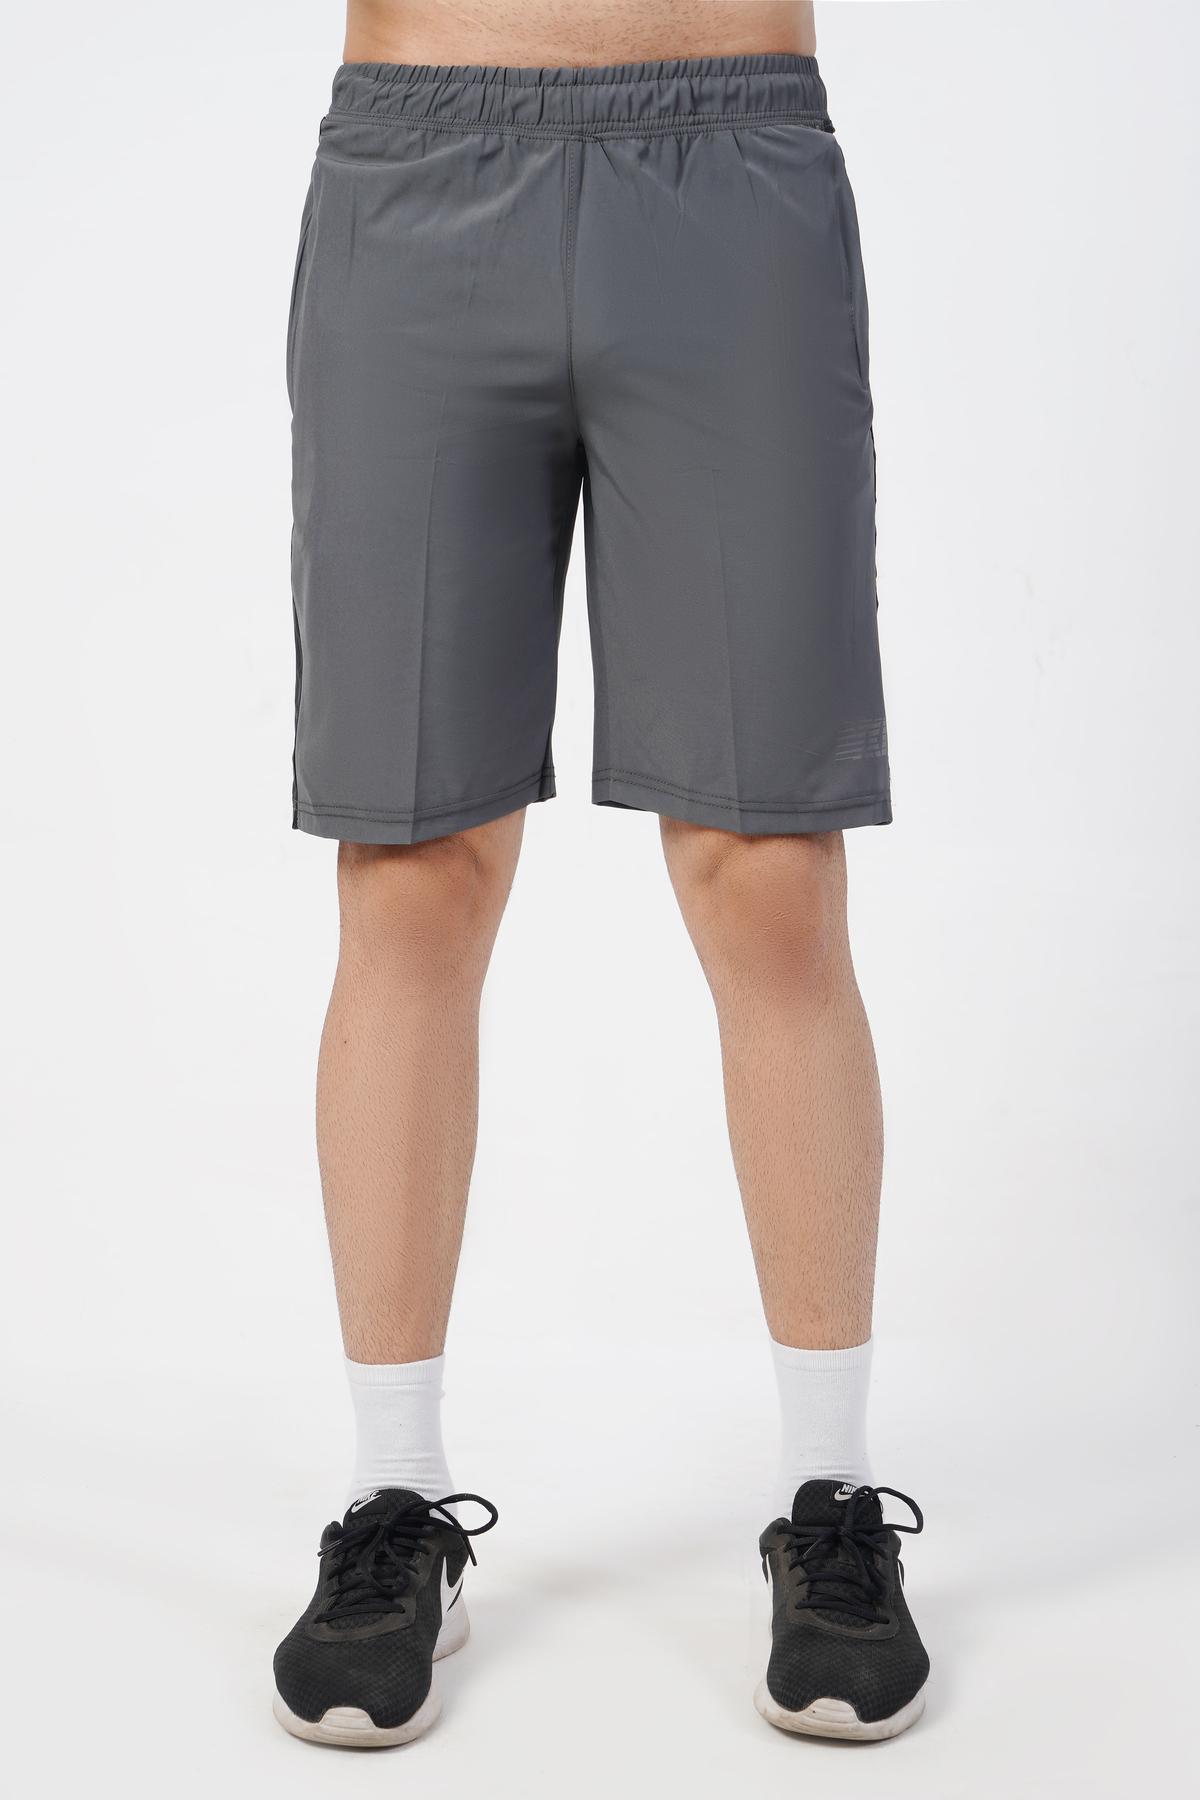 Pursue Strength Gray Shorts